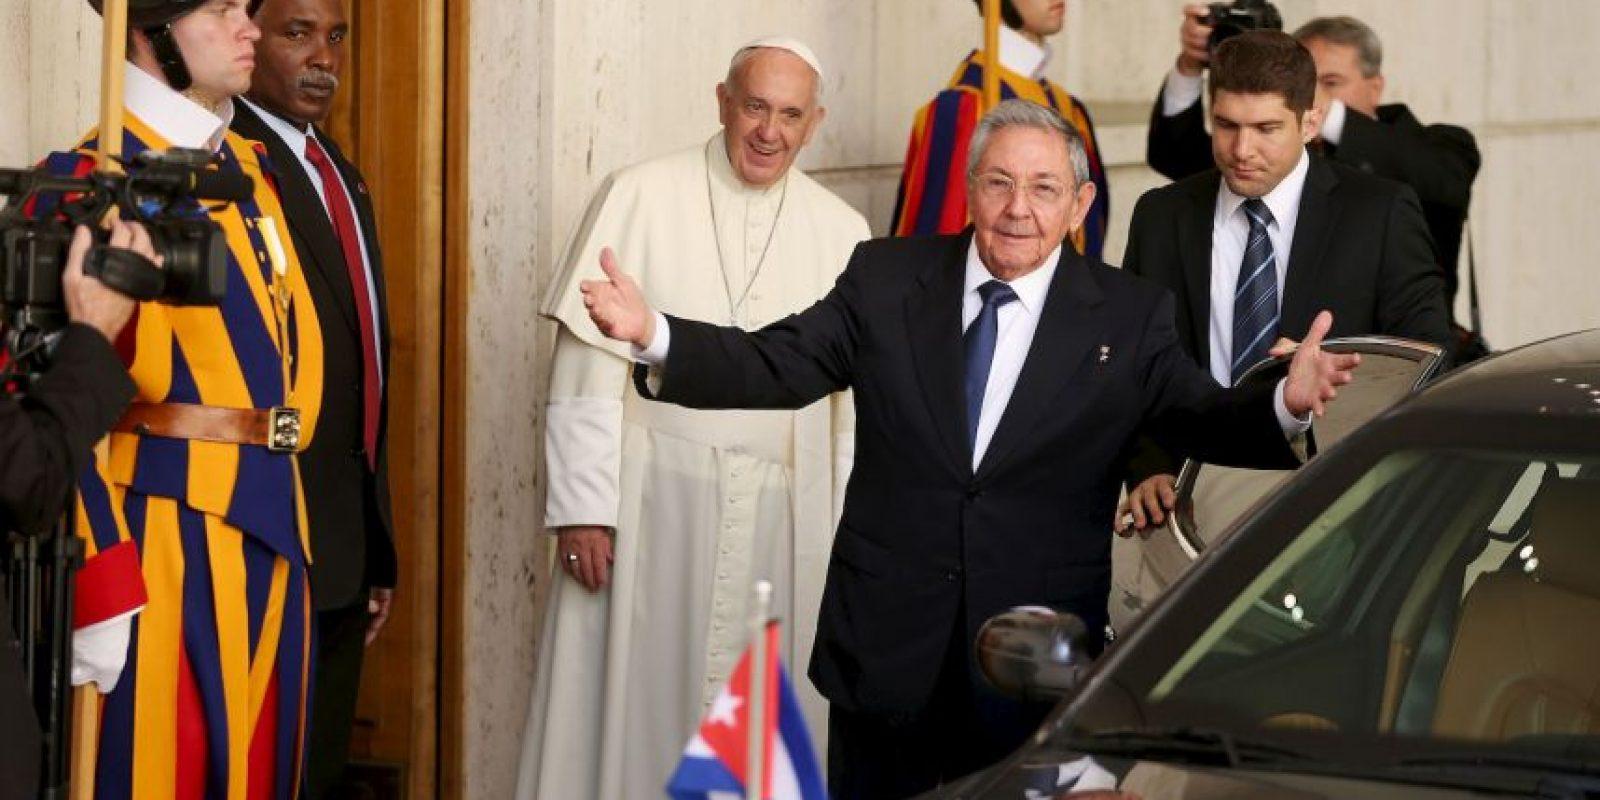 Después de la visita al Vaticano Castro se reunió con el primer ministro italiano Matteo Renzi. Foto:Getty Images